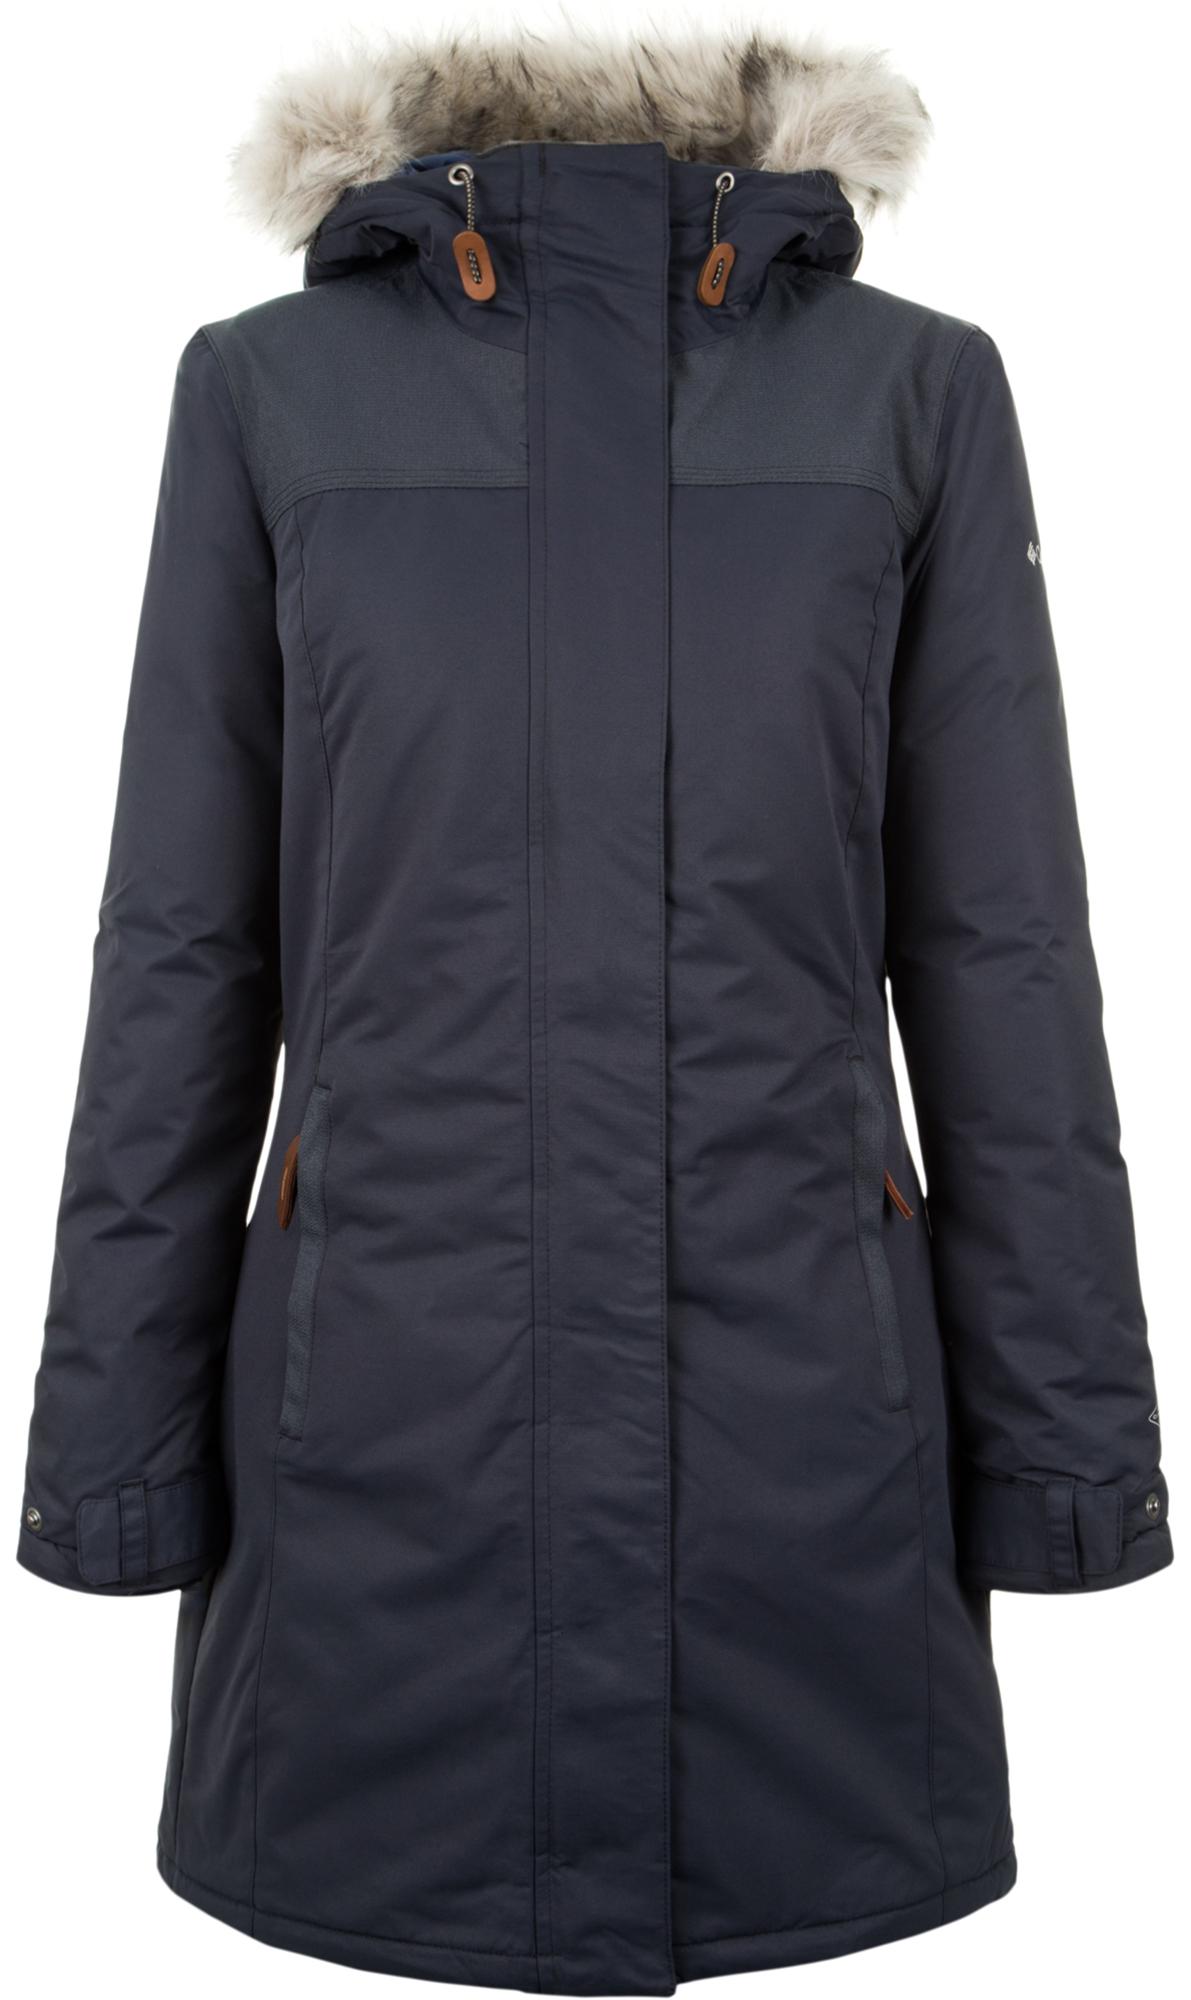 Фото - Columbia Куртка утепленная женская Columbia Lindores, размер 48 куртка женская trussardi цвет темно синий 36s00158 blue night размер l 46 48